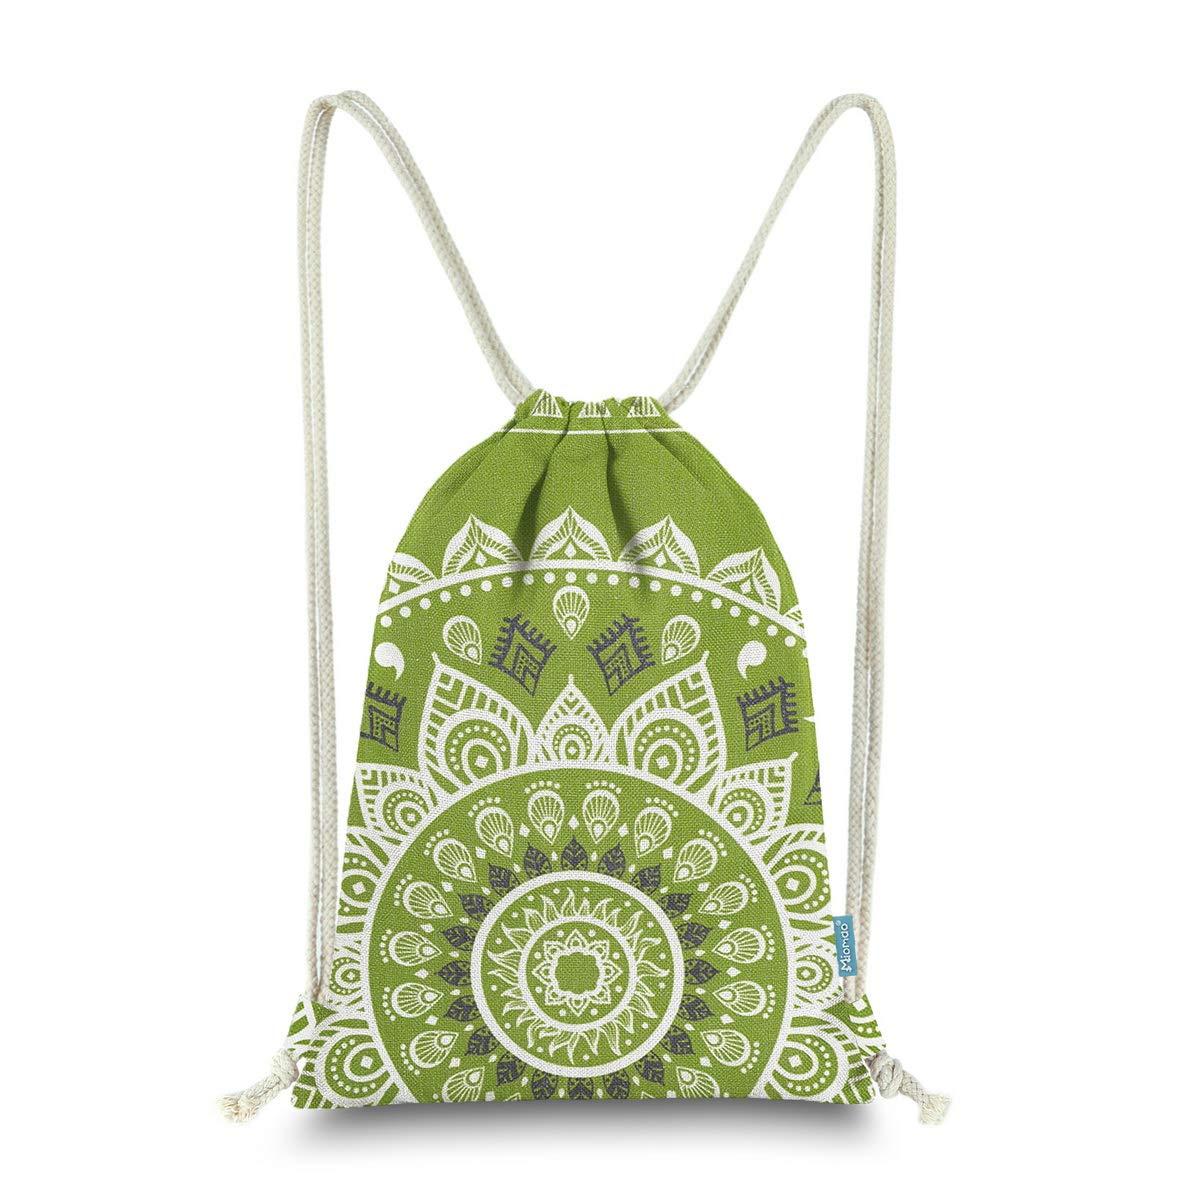 0b34e018b65 Miomao Drawstring Backpack Gym Sack Pack Mandala Style String Bag With  Pocket Canvas Sinch Sack Sport Cinch Pack Christmas Gift Bags Beach  Rucksack 13 X 18 ...